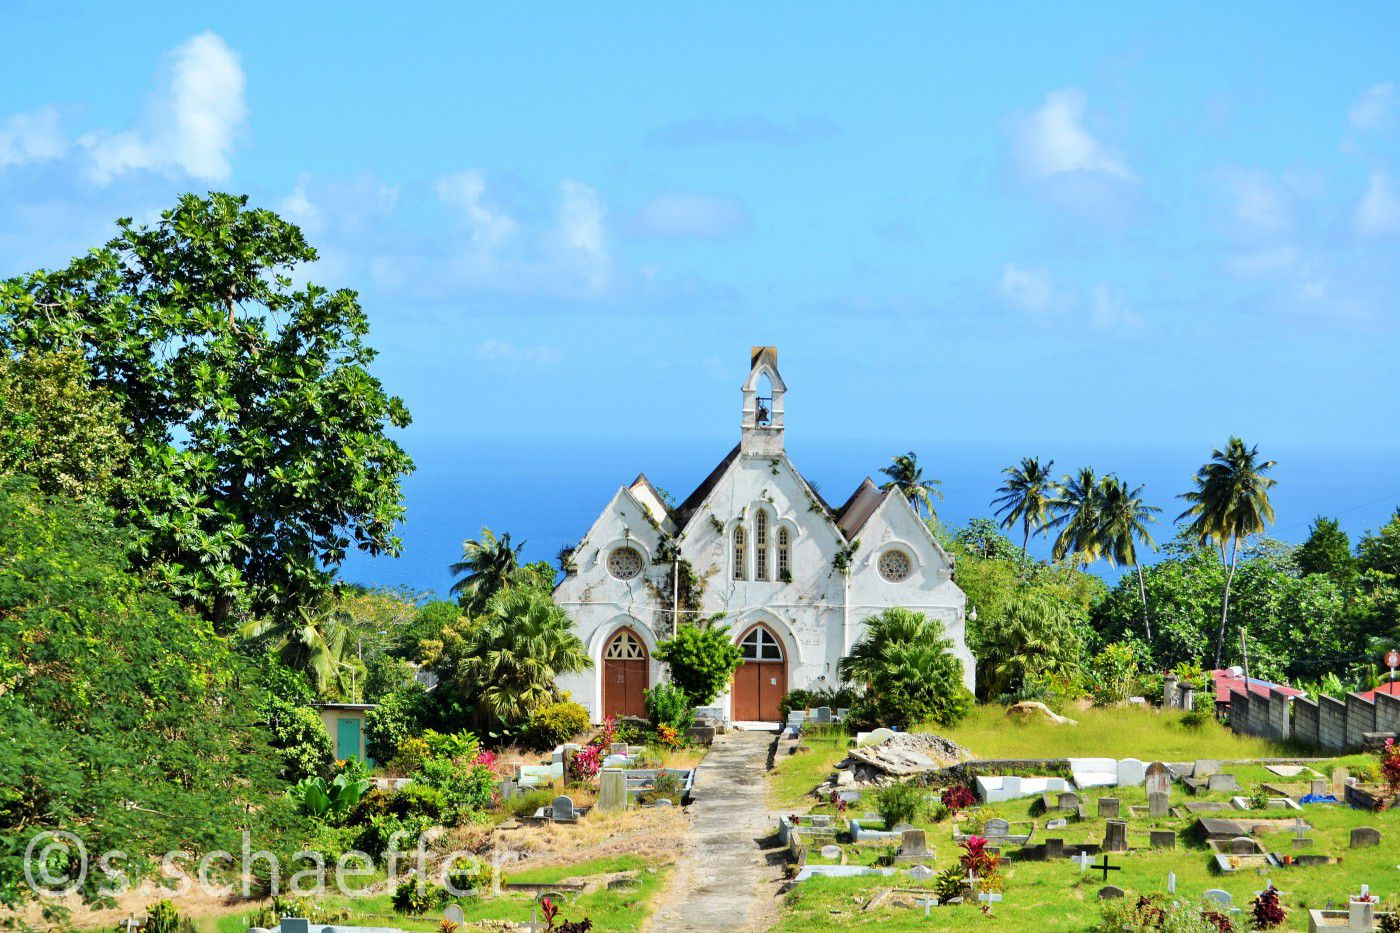 Barbados: St. Joseph Parish Church